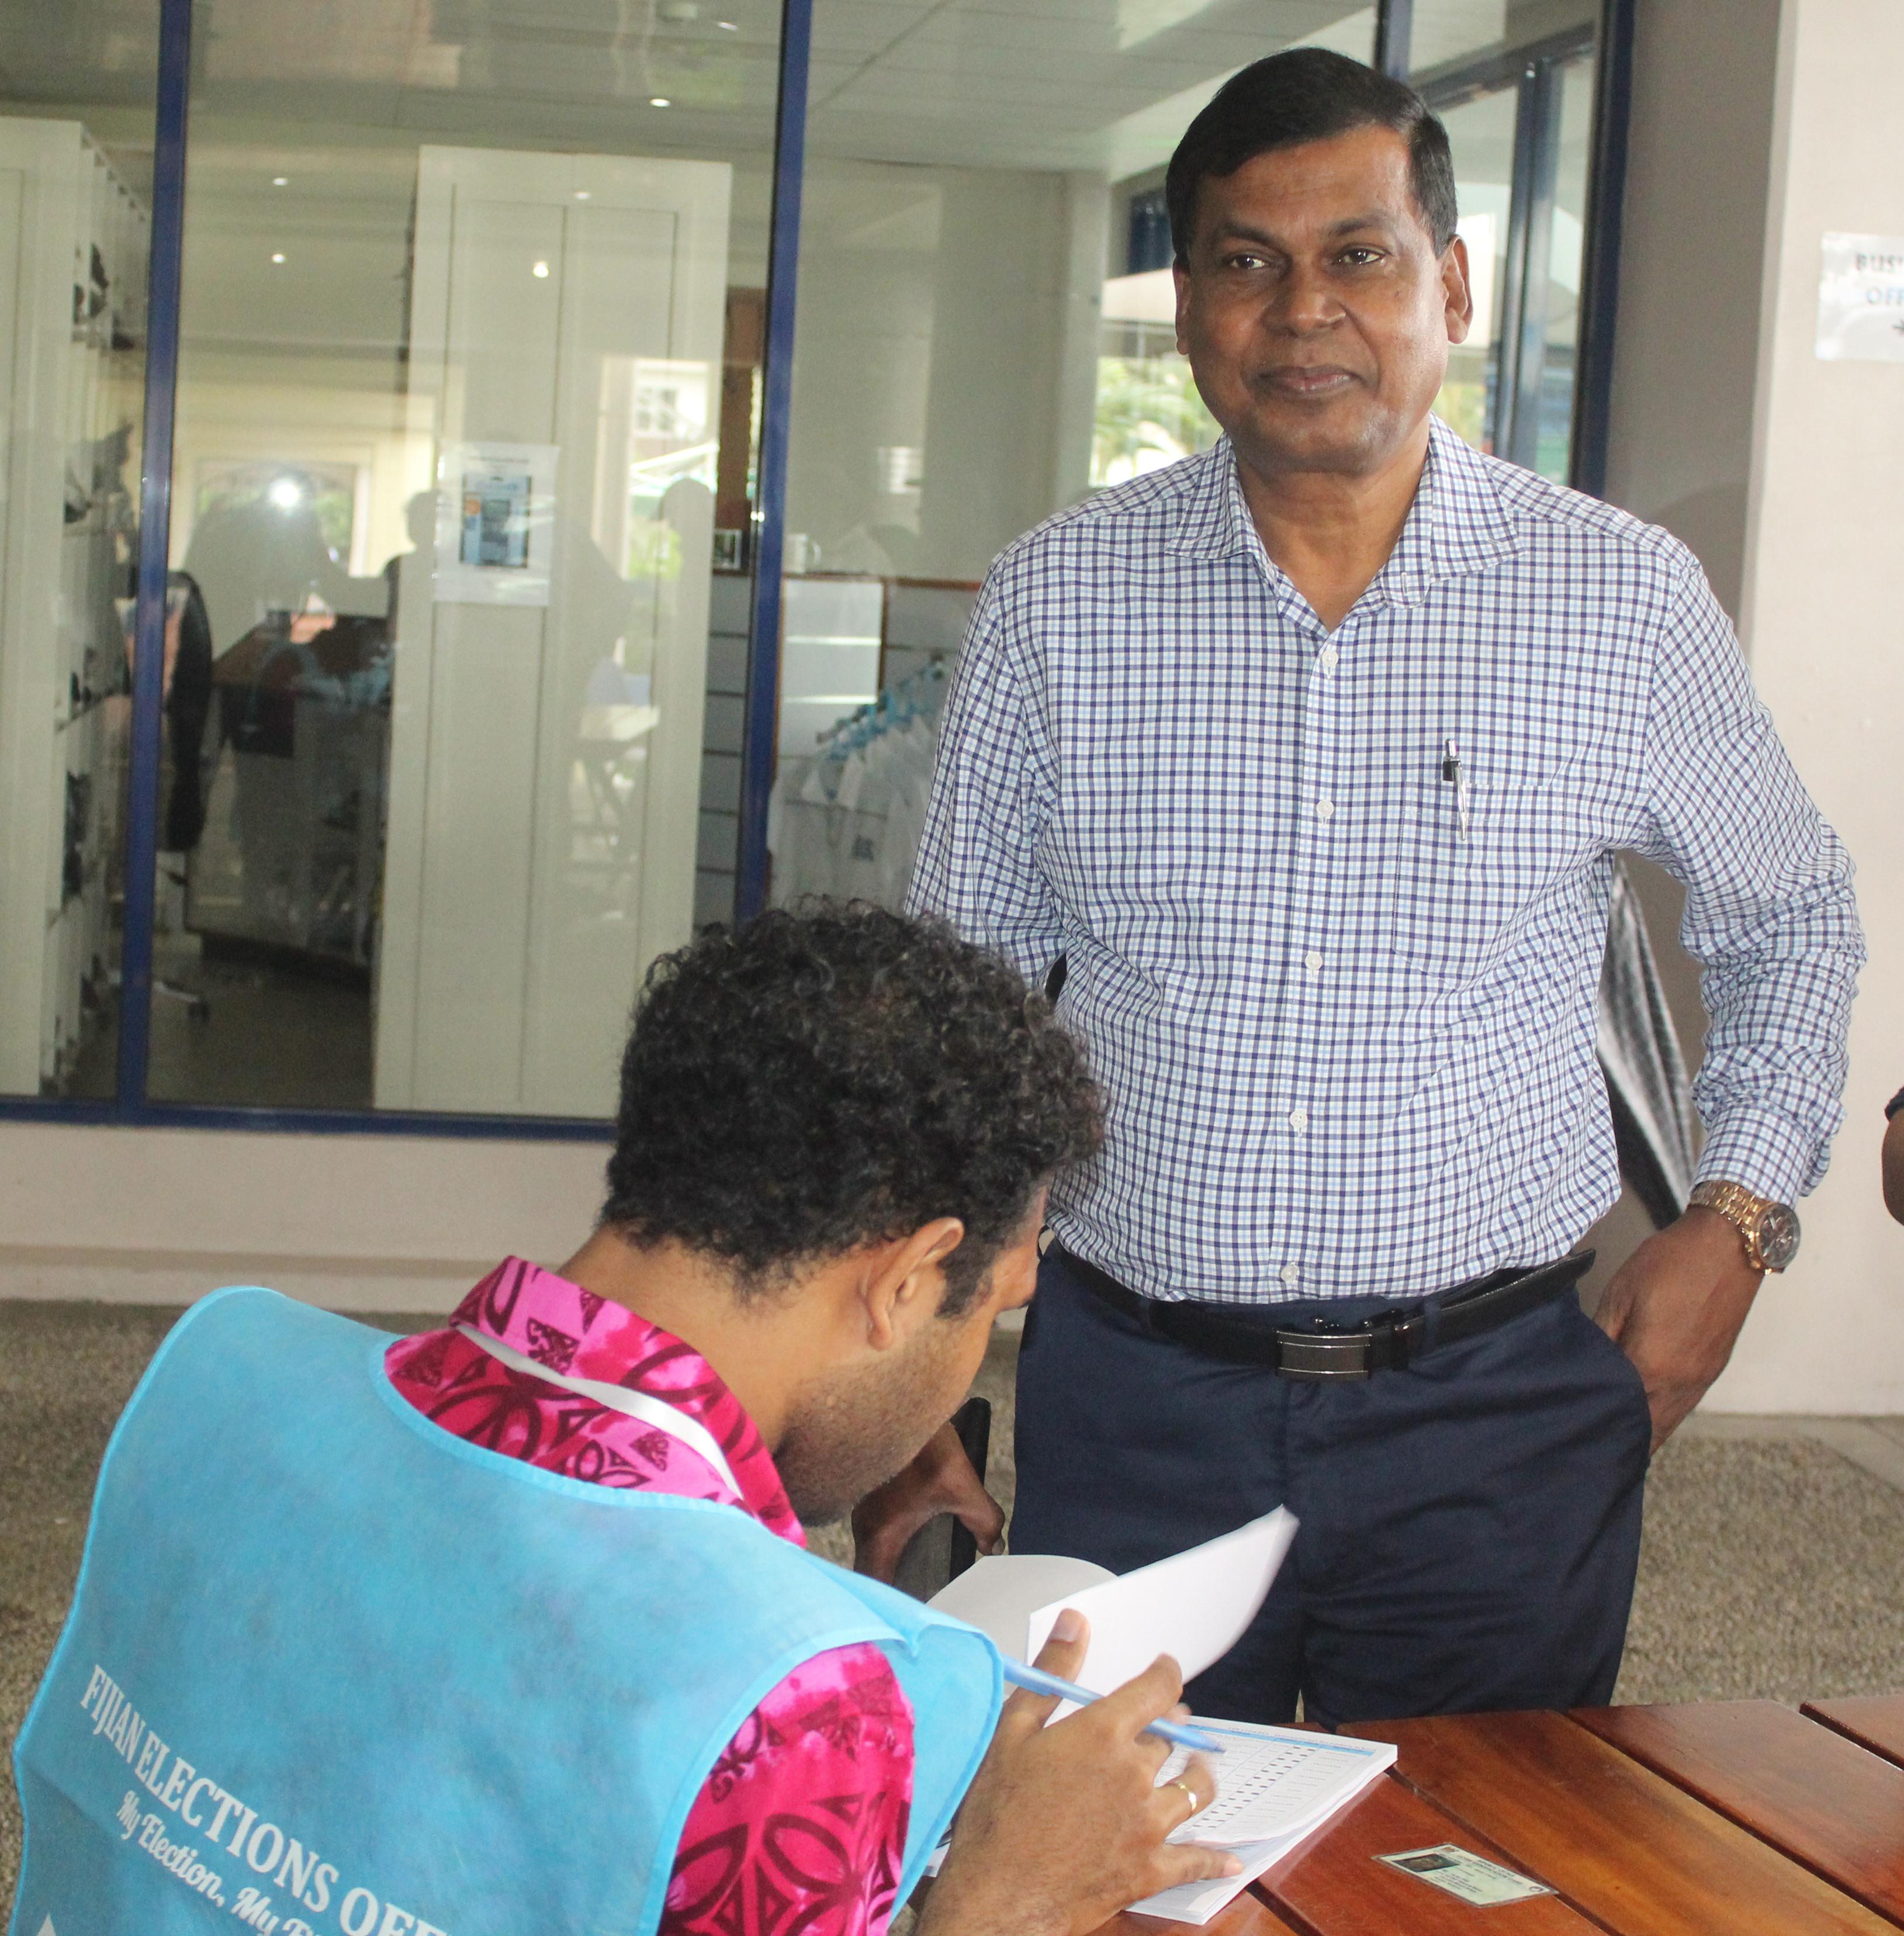 National Federation Party leader  Biman Prasad casts his ballot on  November 14, 2018 at the International Secondary School, Laucala Beach.  Simione Haravanua Photo journalist